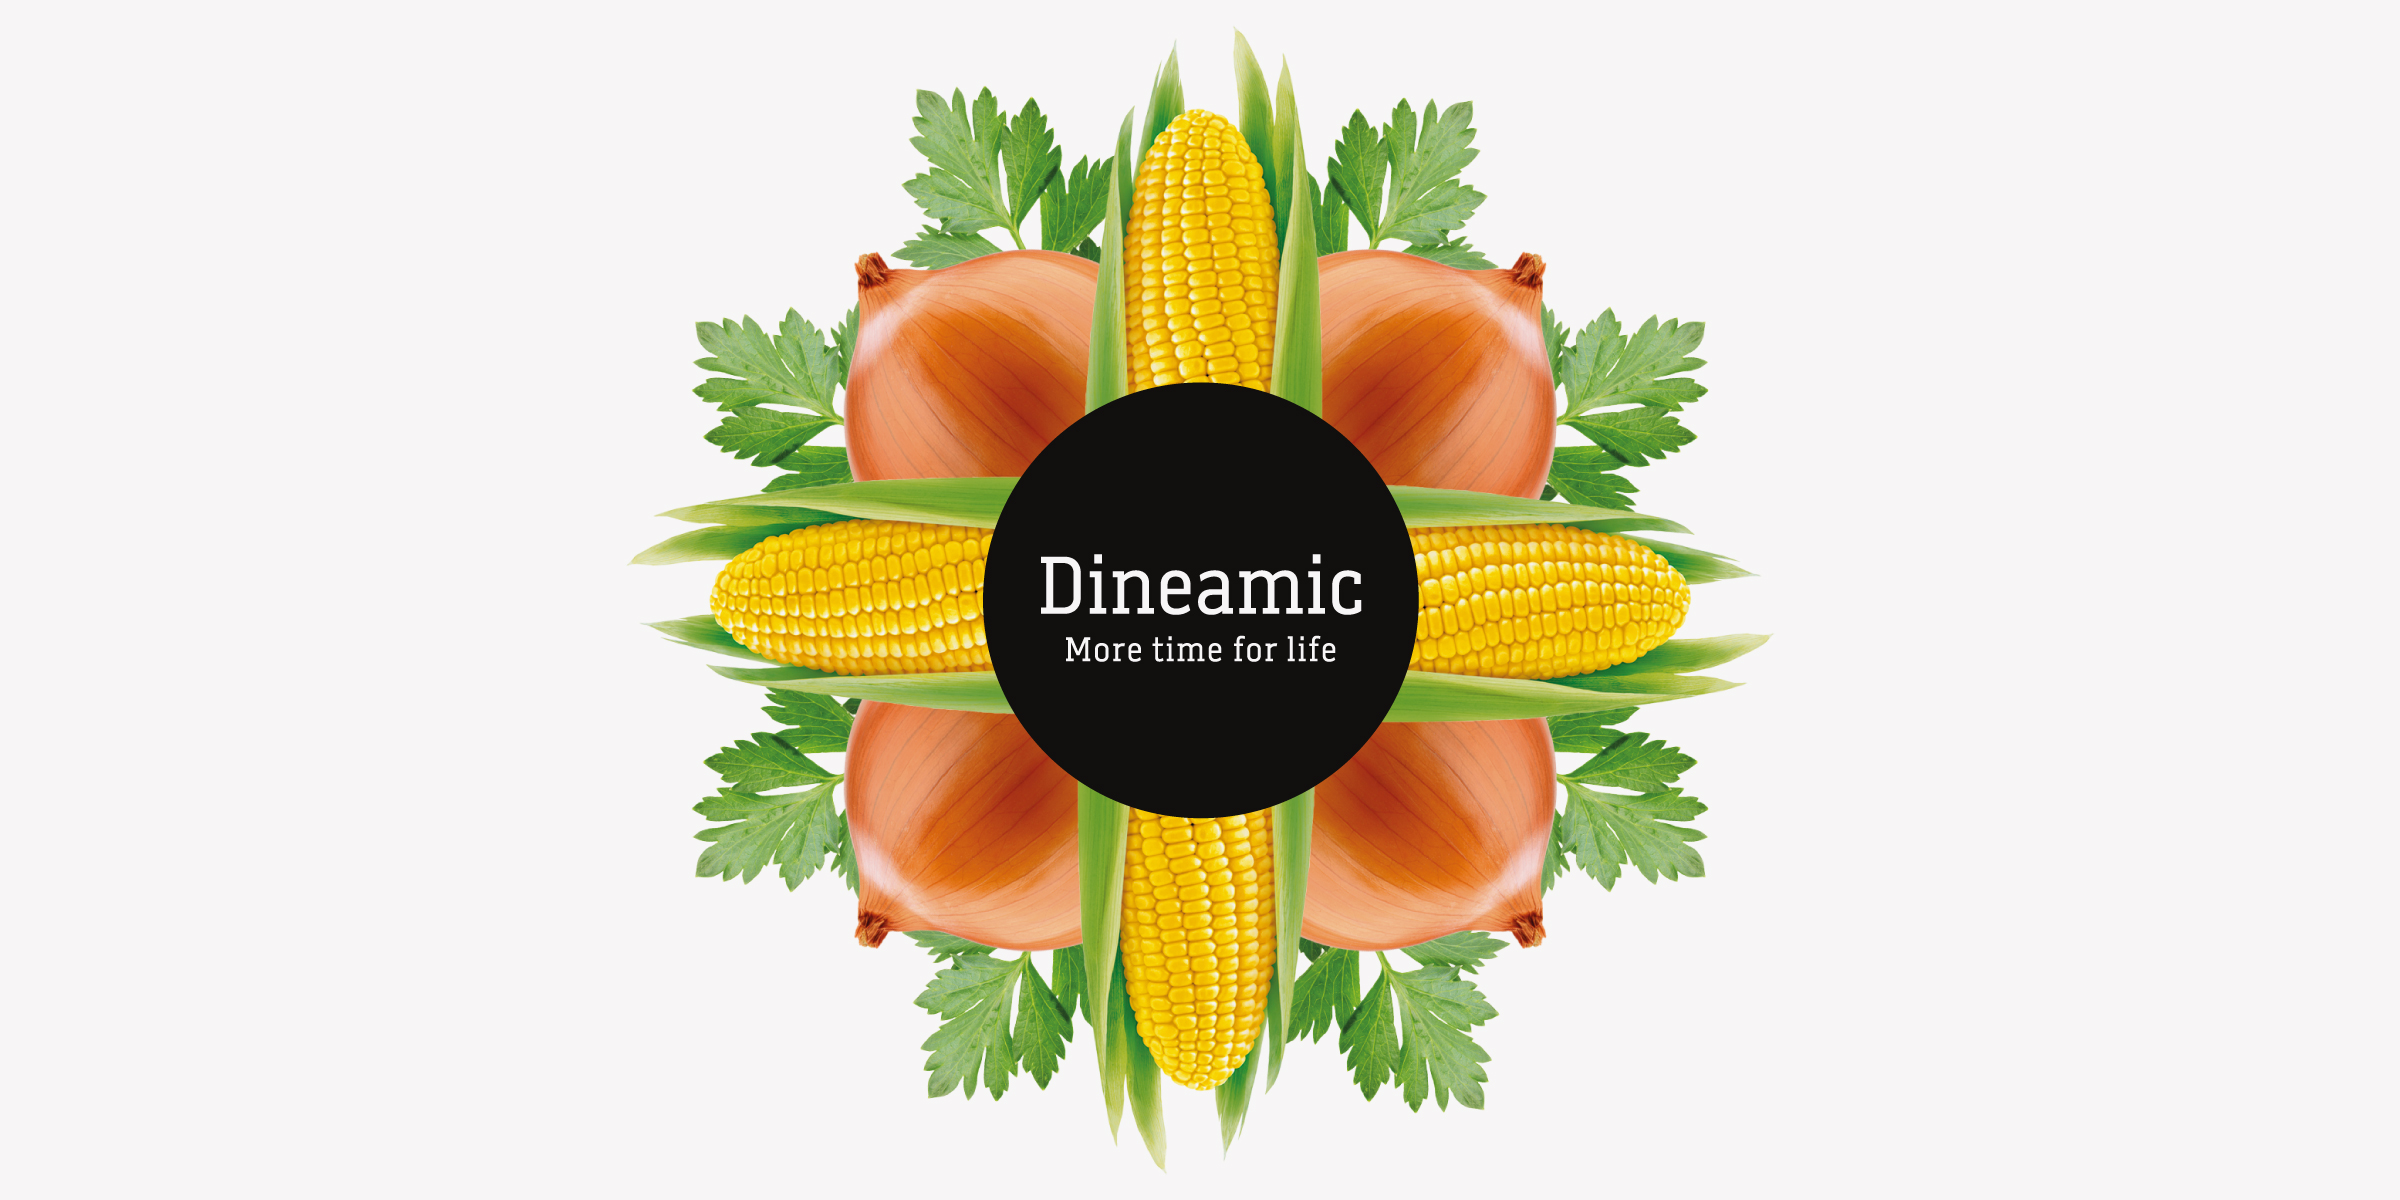 Davidson Branding FMCG Dineamic Packaging Visual Language Kaleidoscope Corn Onion Banner